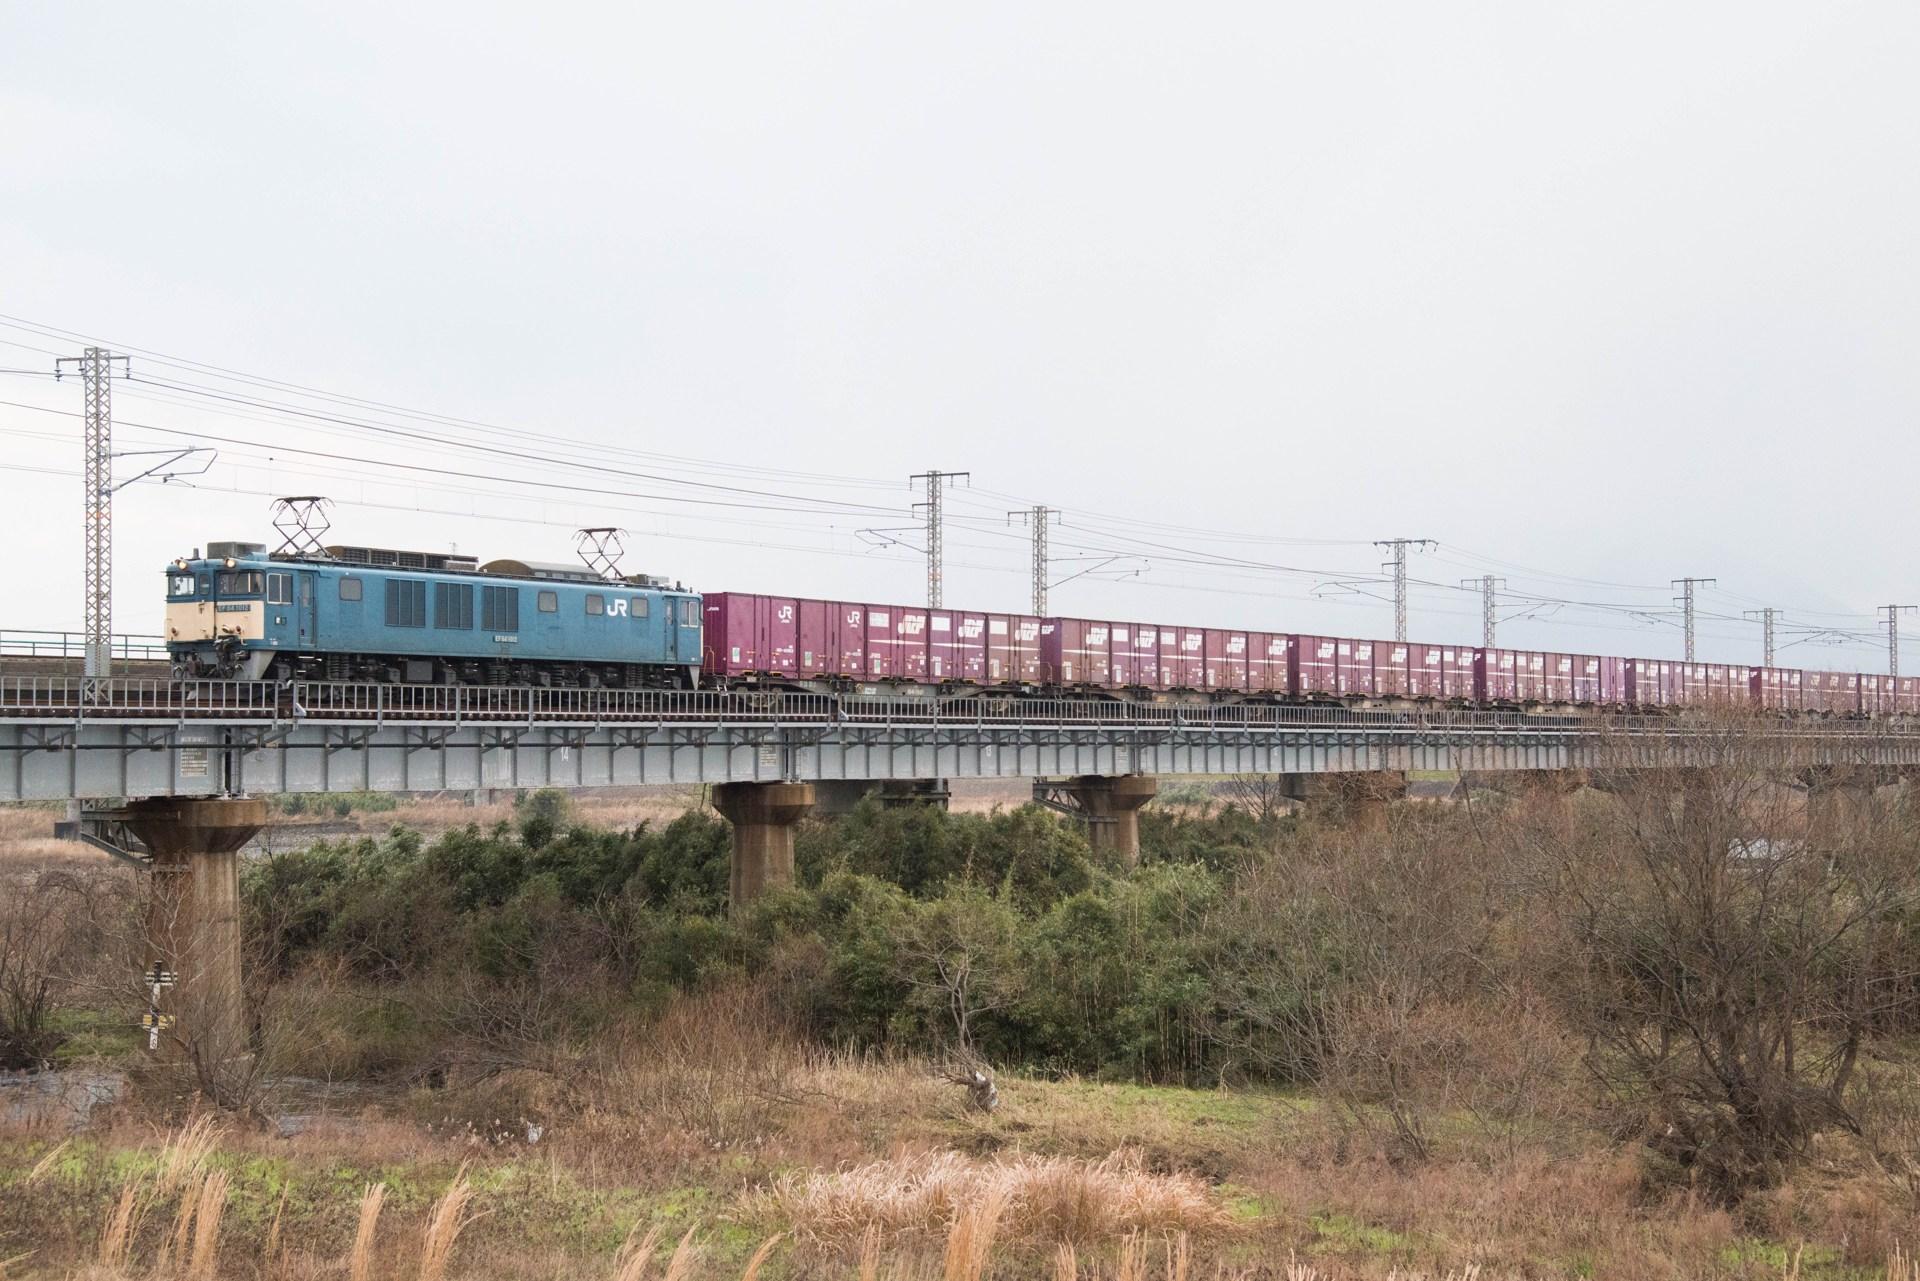 20150111hakubi-1269.jpg